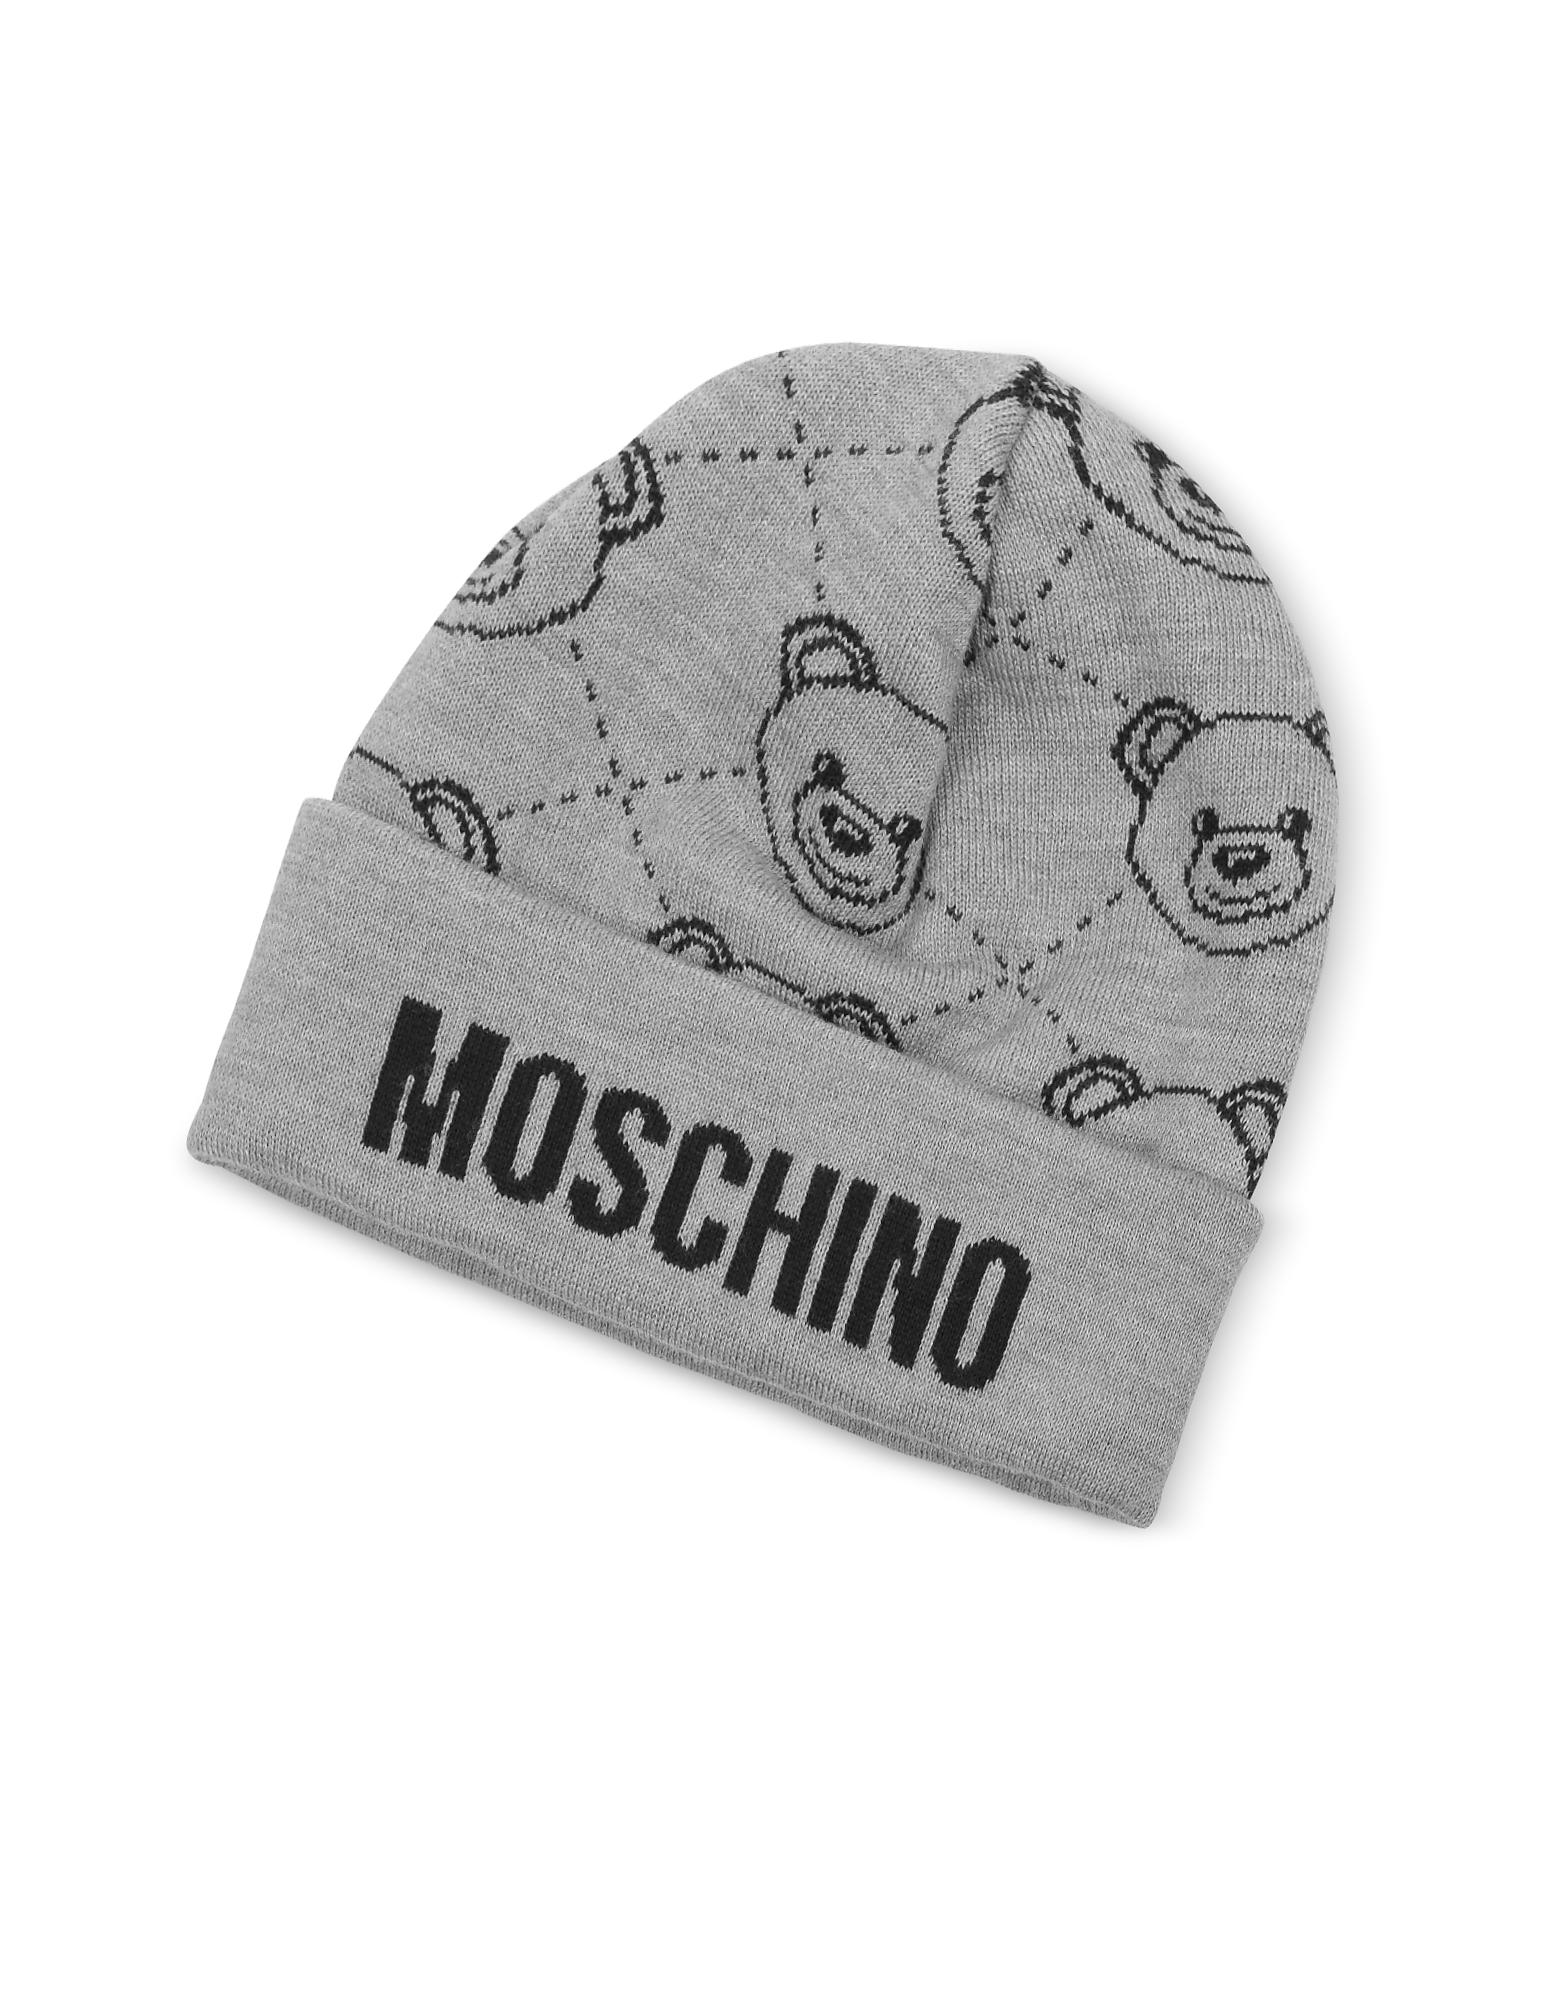 Gray Moschino Beanie w/ Teddy Bear Print